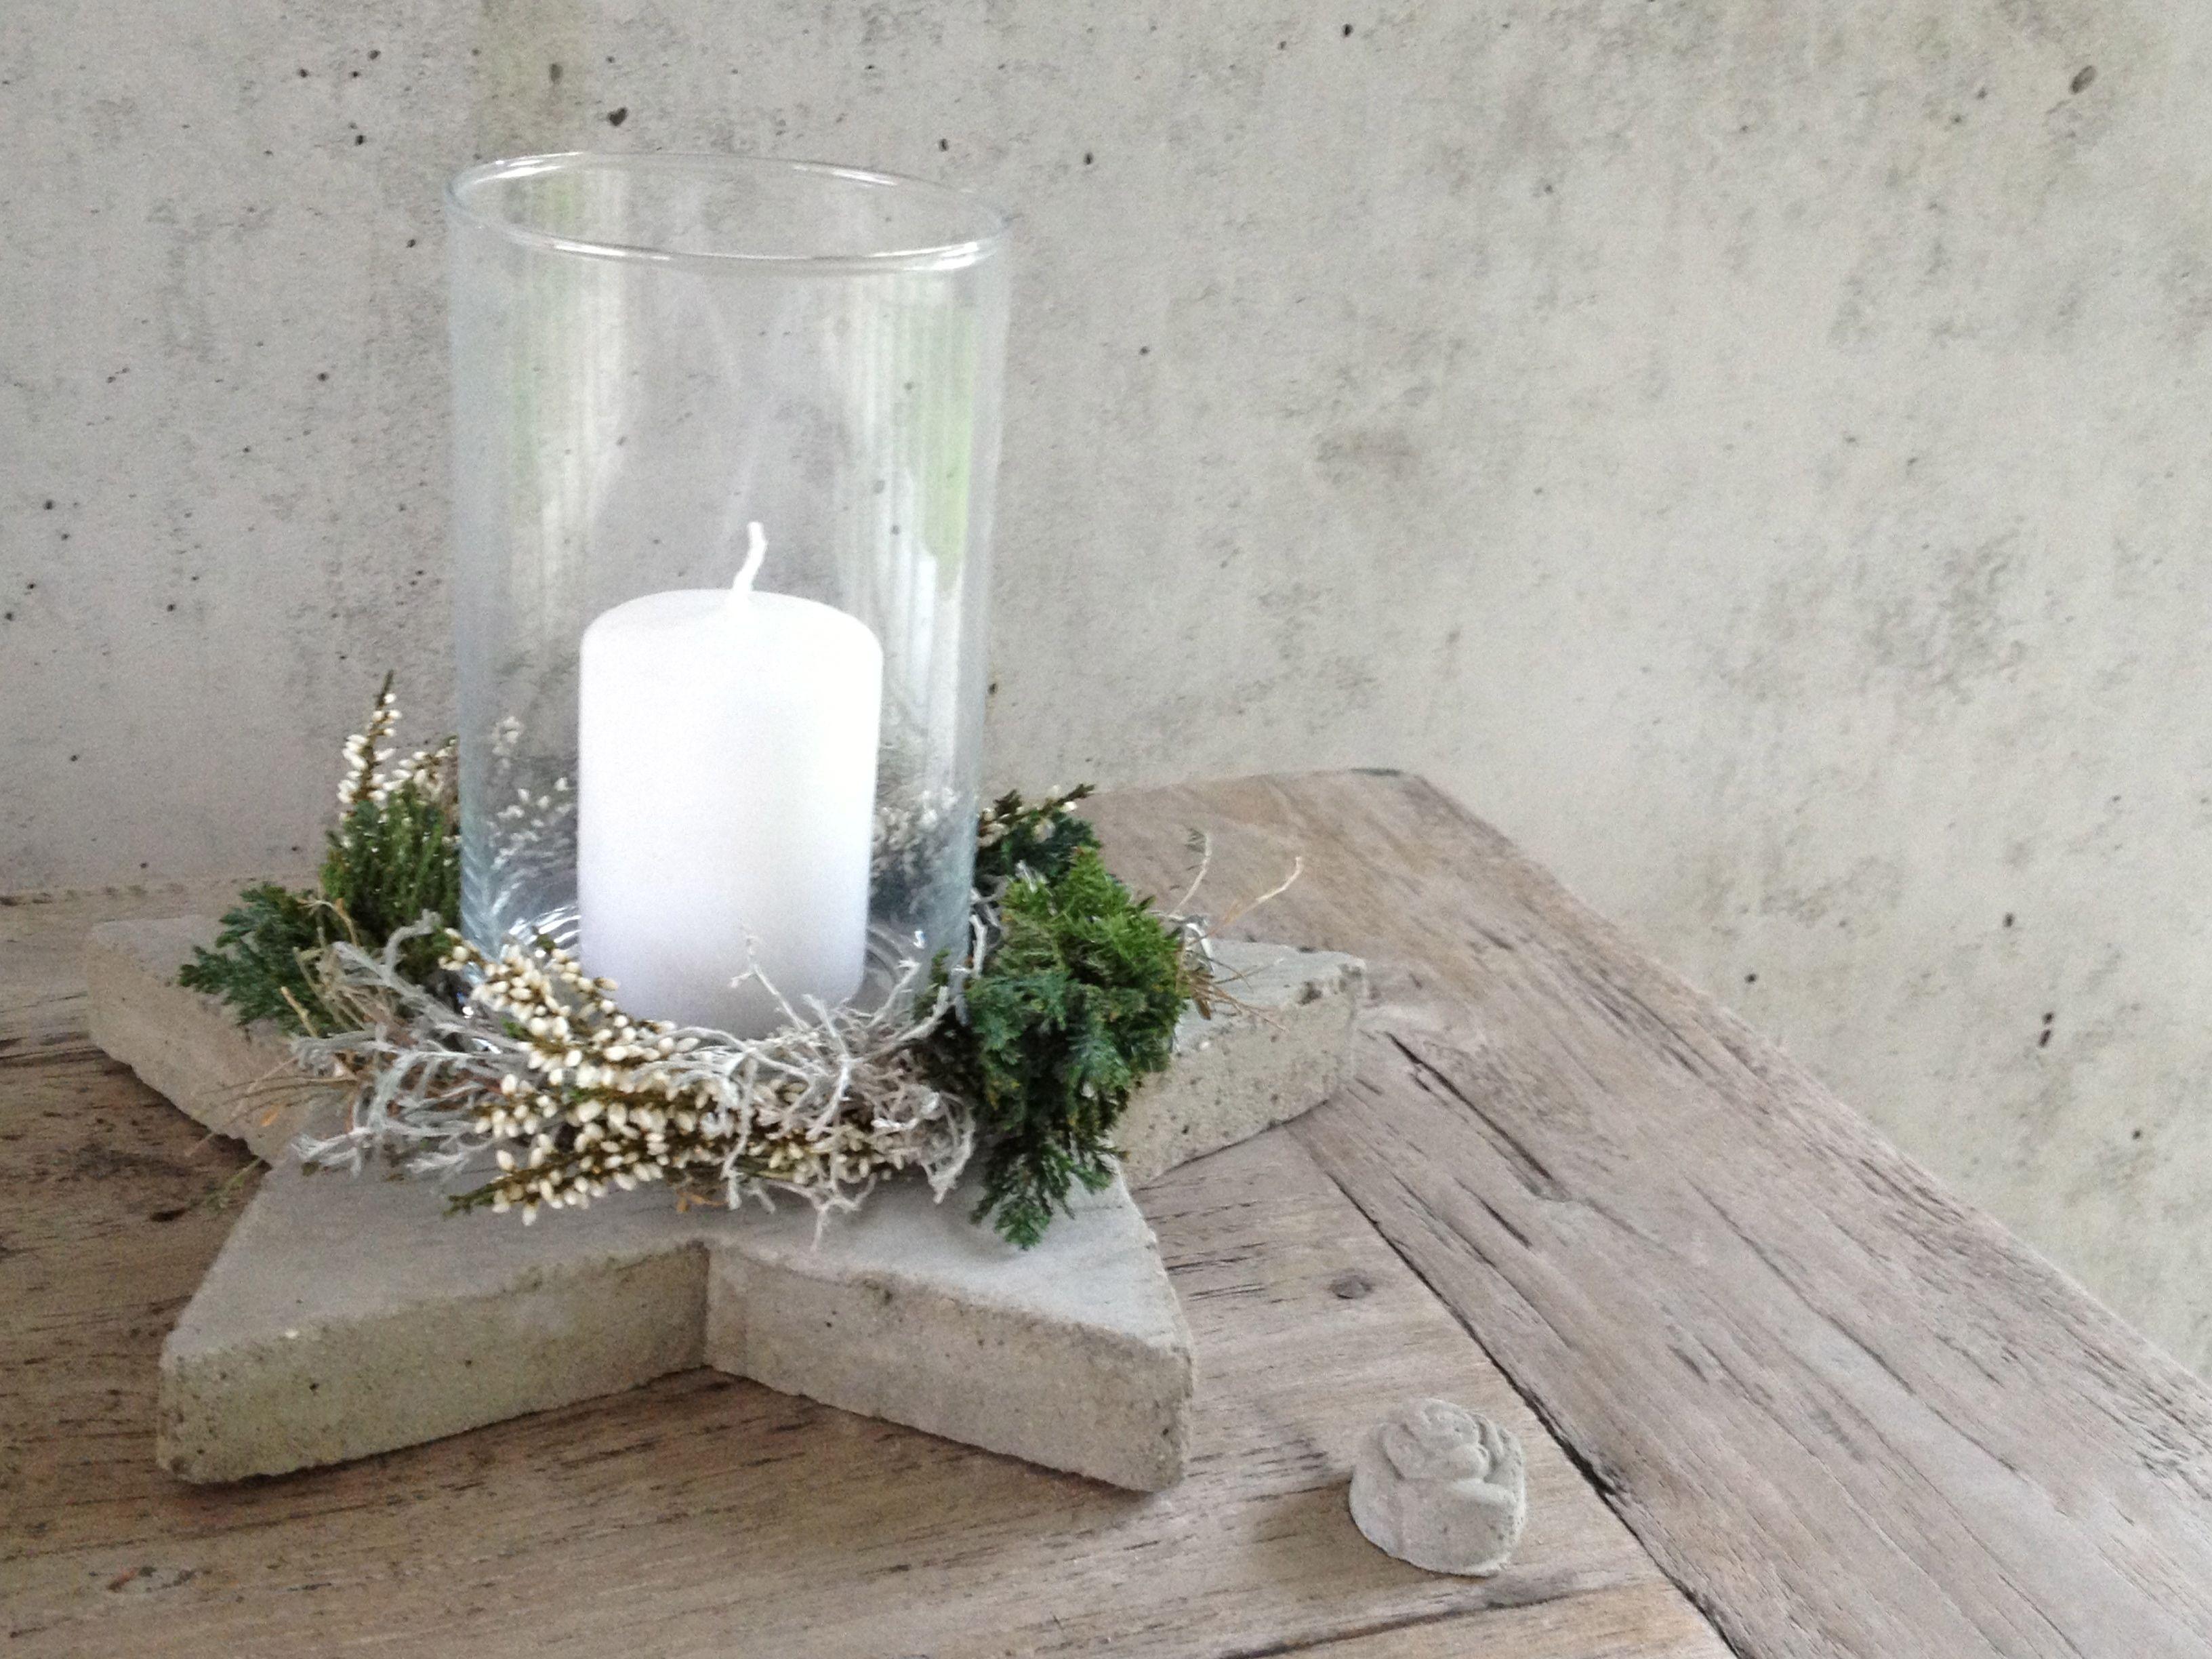 img 0494 printable pinterest beton deko deko. Black Bedroom Furniture Sets. Home Design Ideas